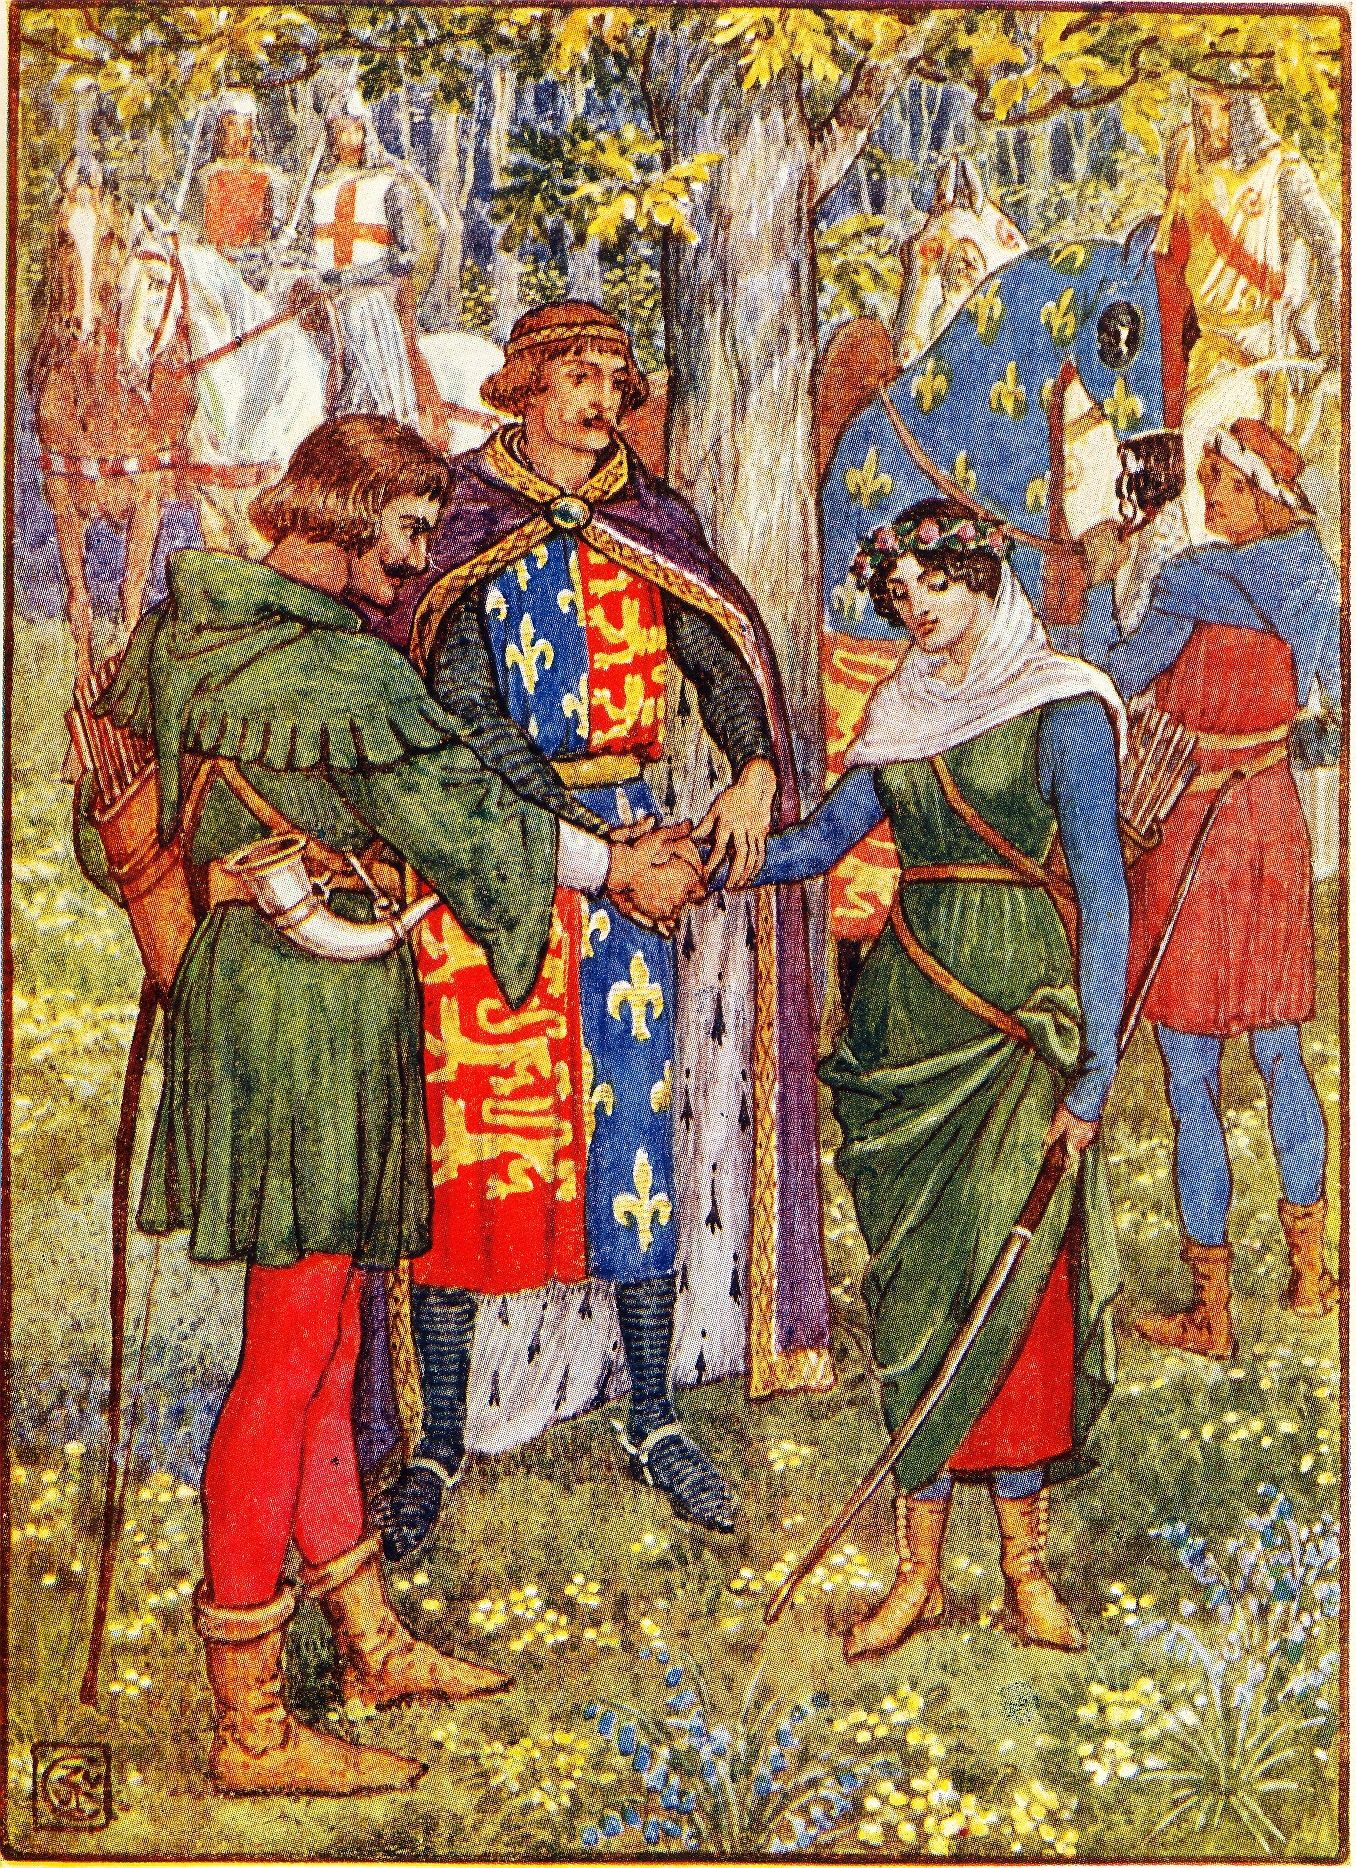 Robin Hood Walter Crane Illustration Robin Hood